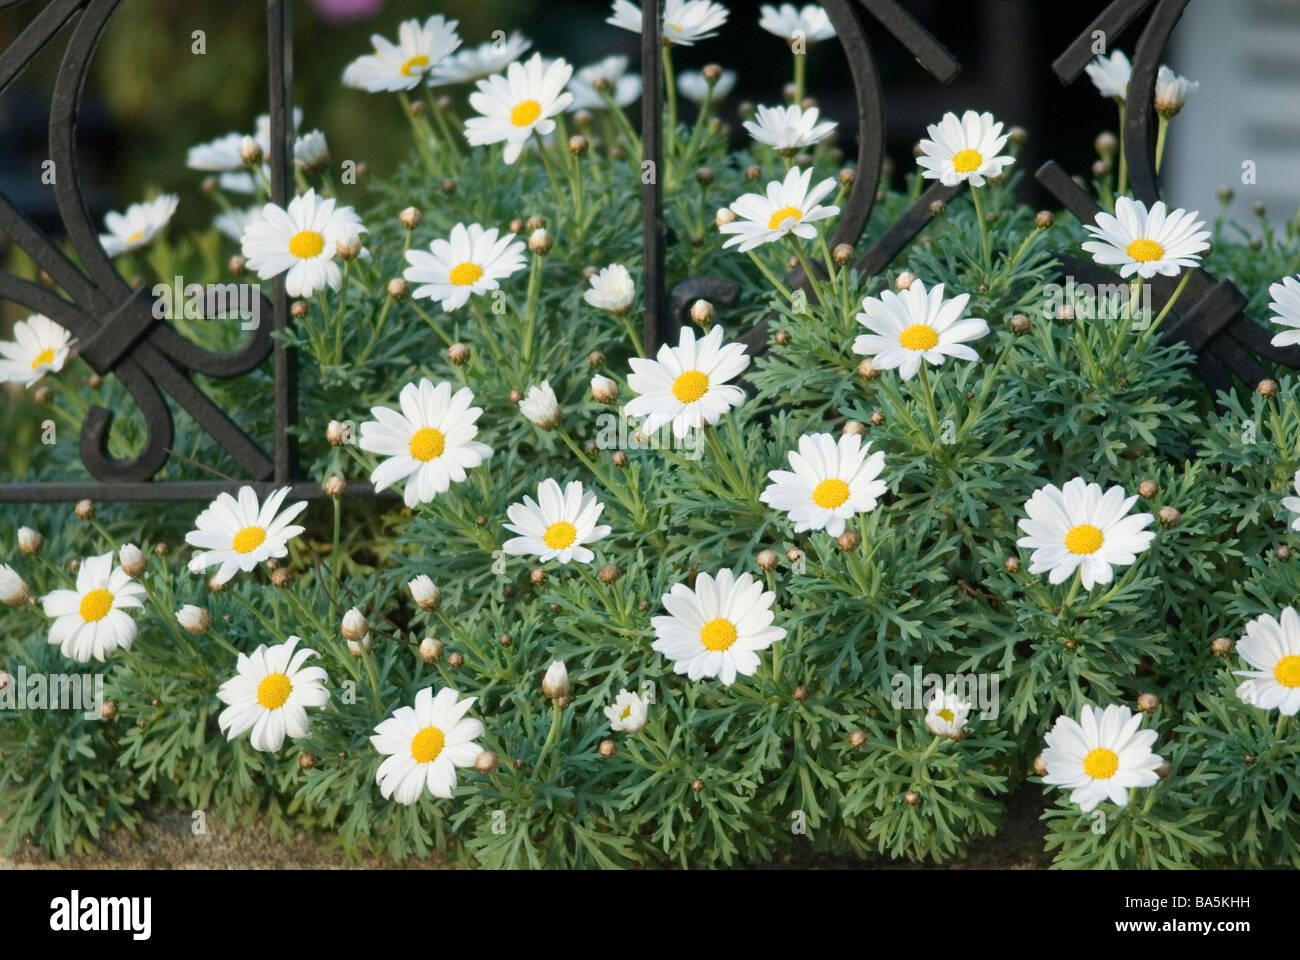 Chamomile Anthemis sp., Asteraceae - Stock Image